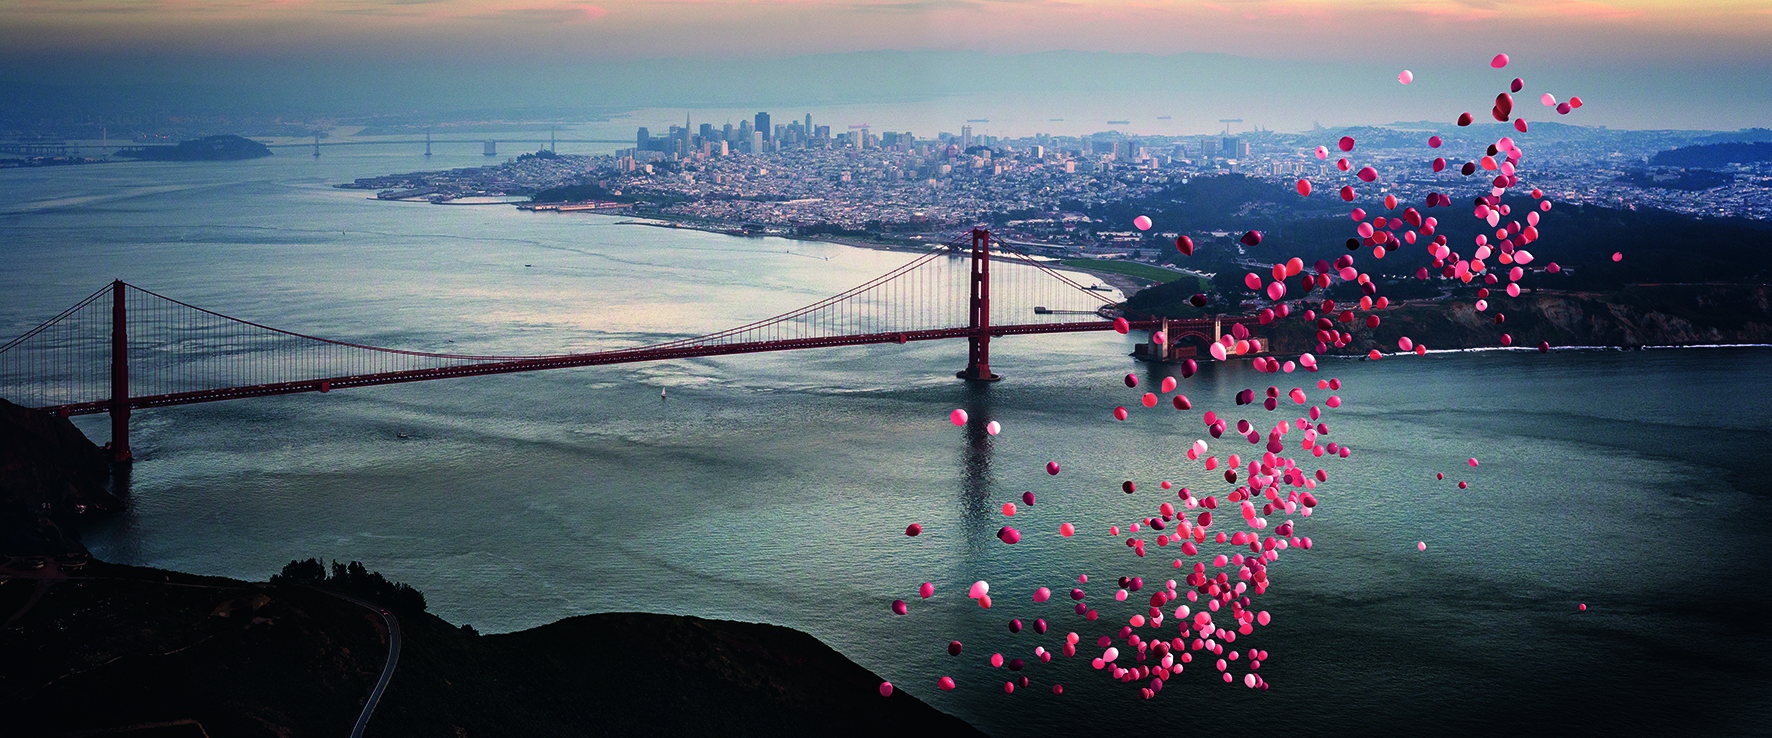 """Balloons over San Francisco"" (David Drebin/teNeues)"